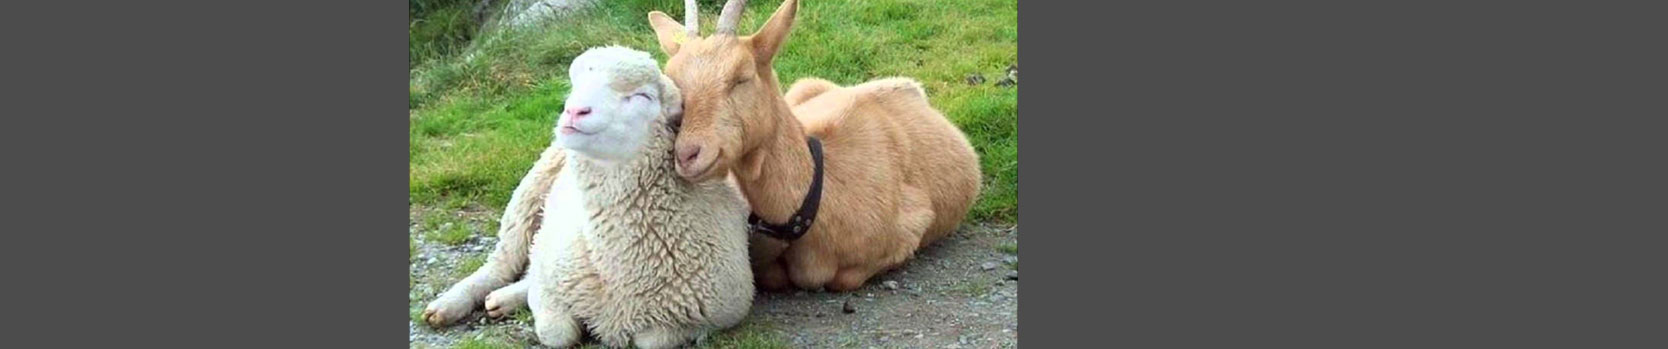 home-slider-sheep-goats